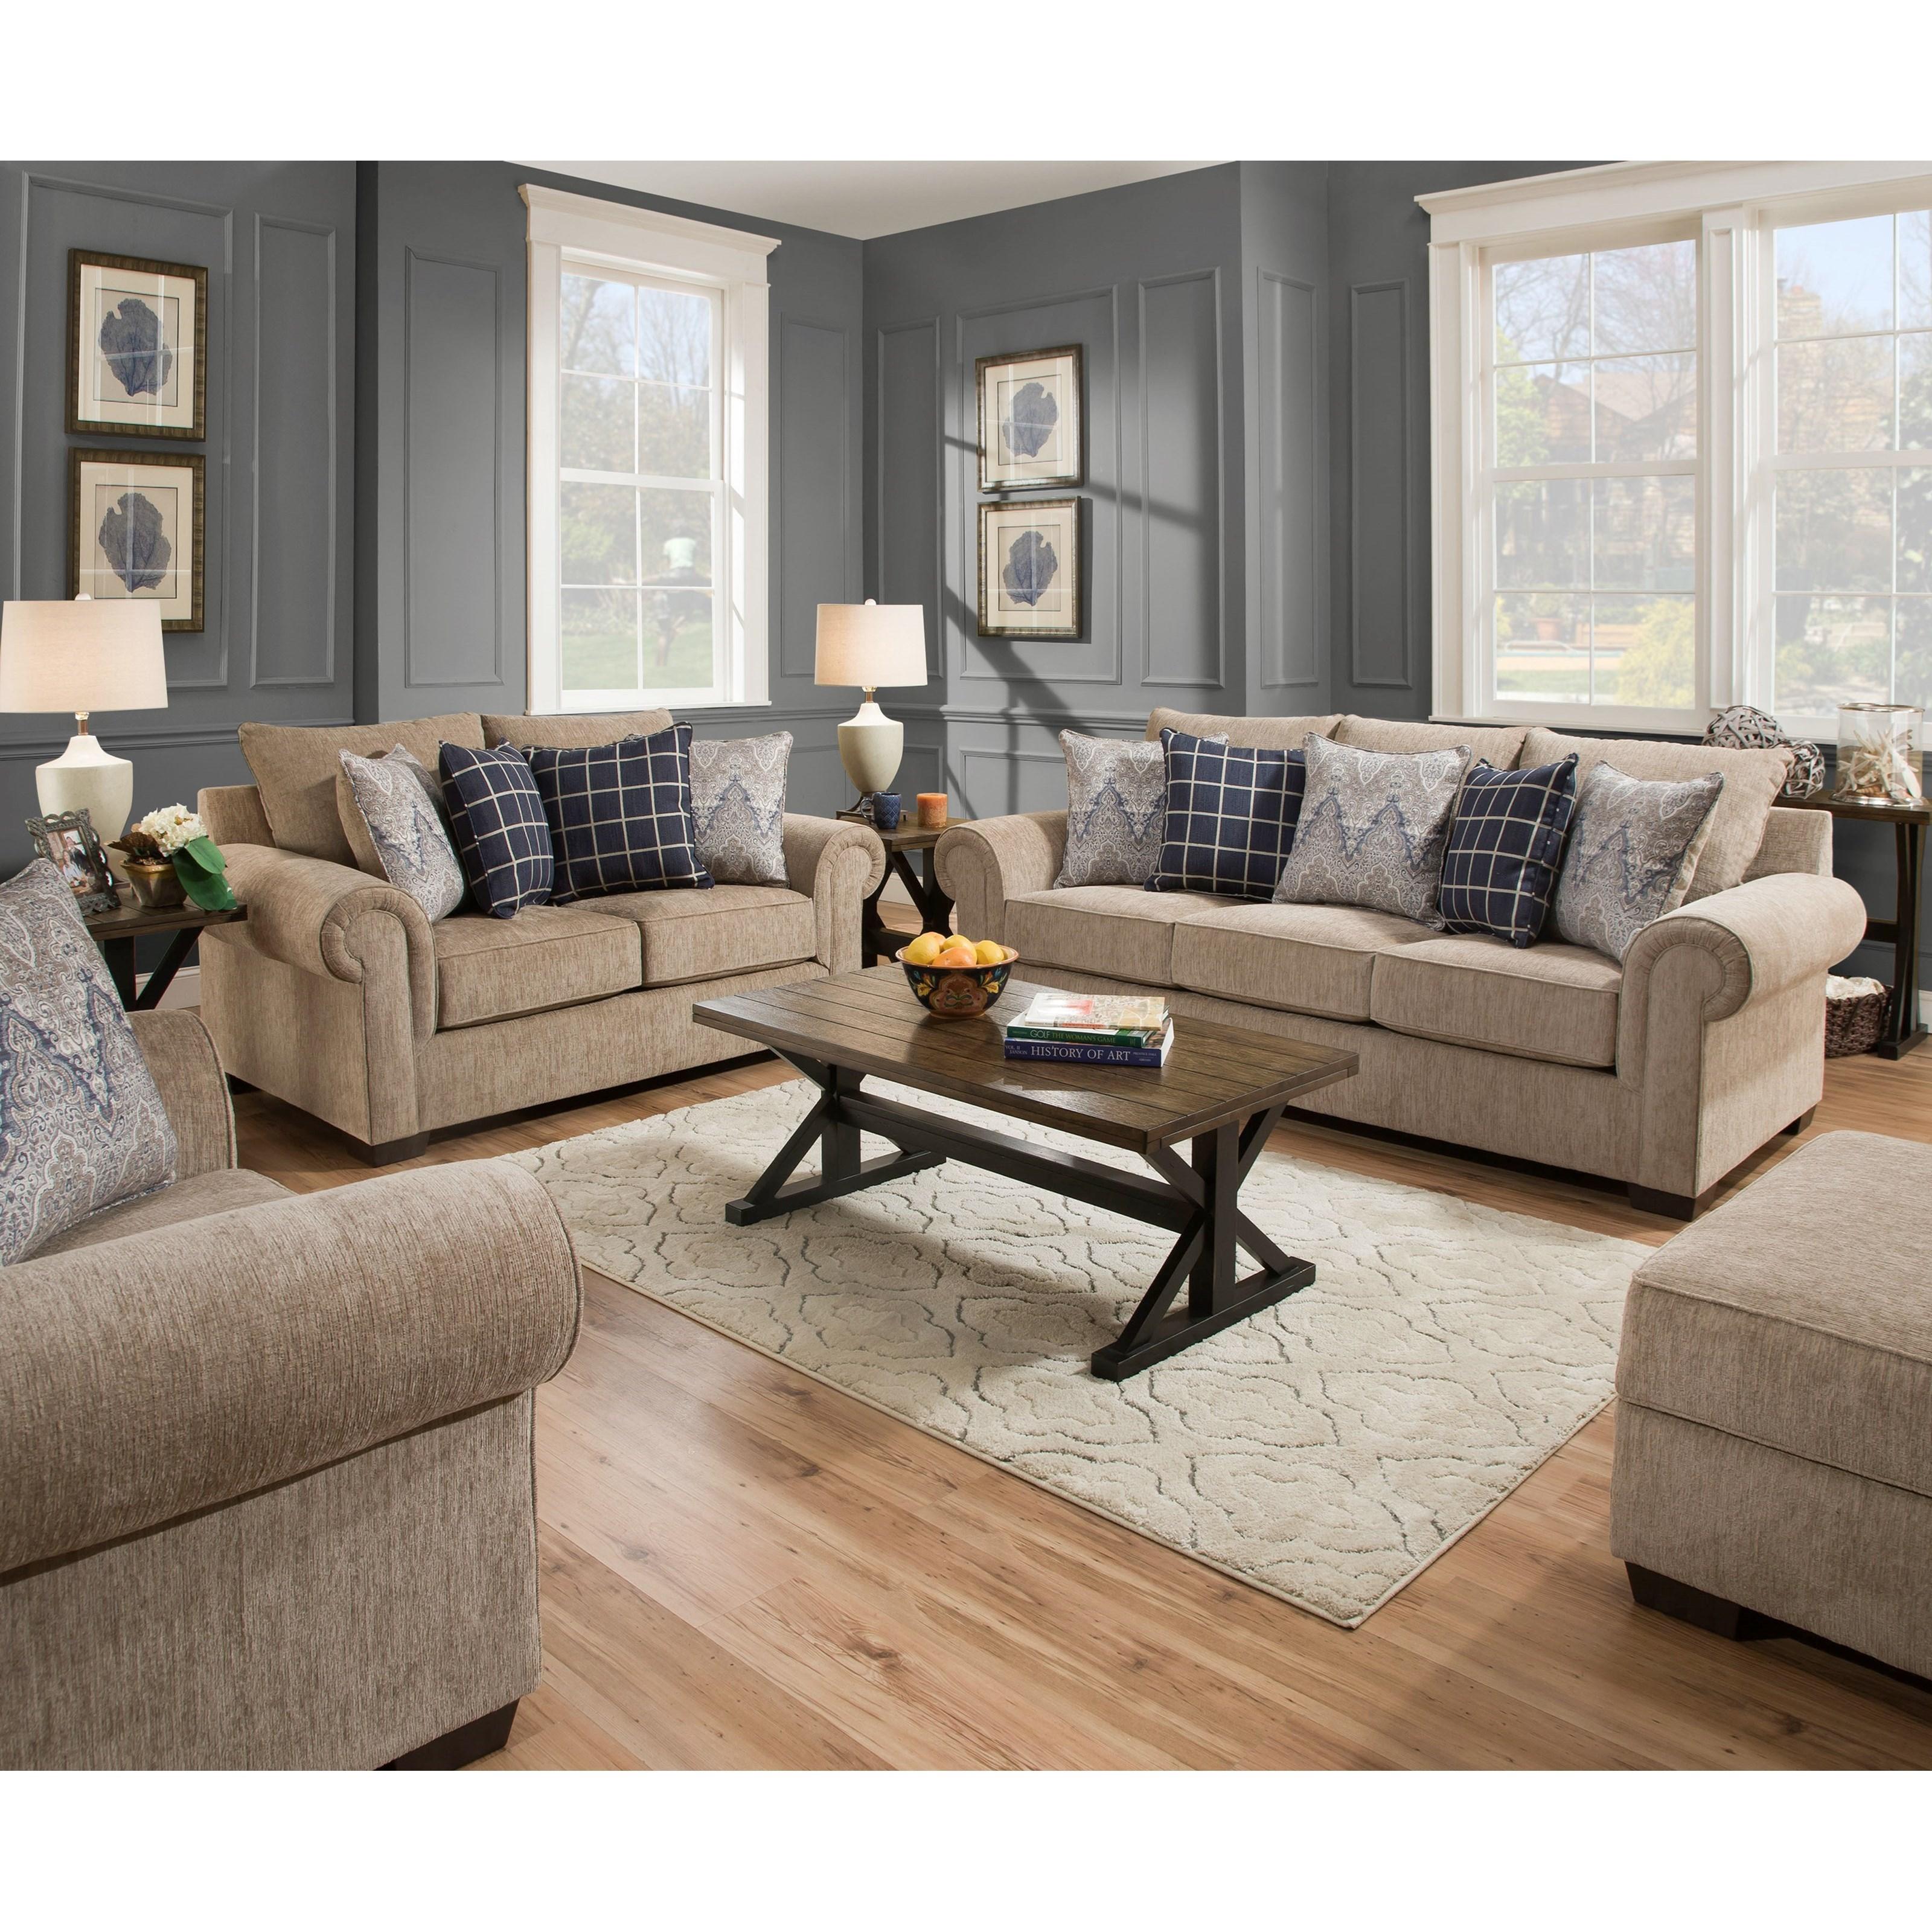 Simmons Upholstery 7592BR Living Room Group Royal Furniture Stationary Li